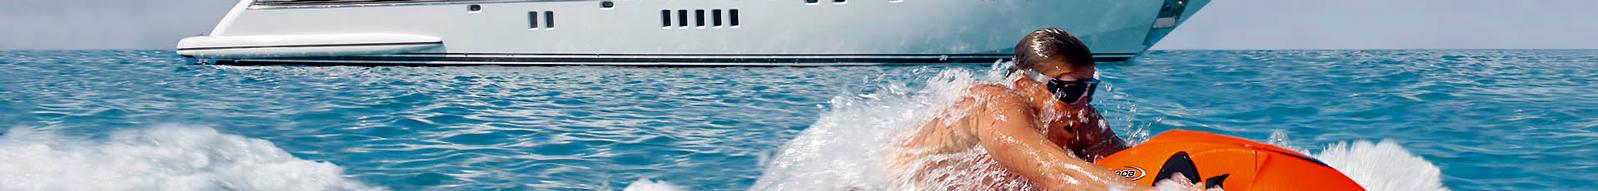 inshore yachts wholesaler golfe juan seabob